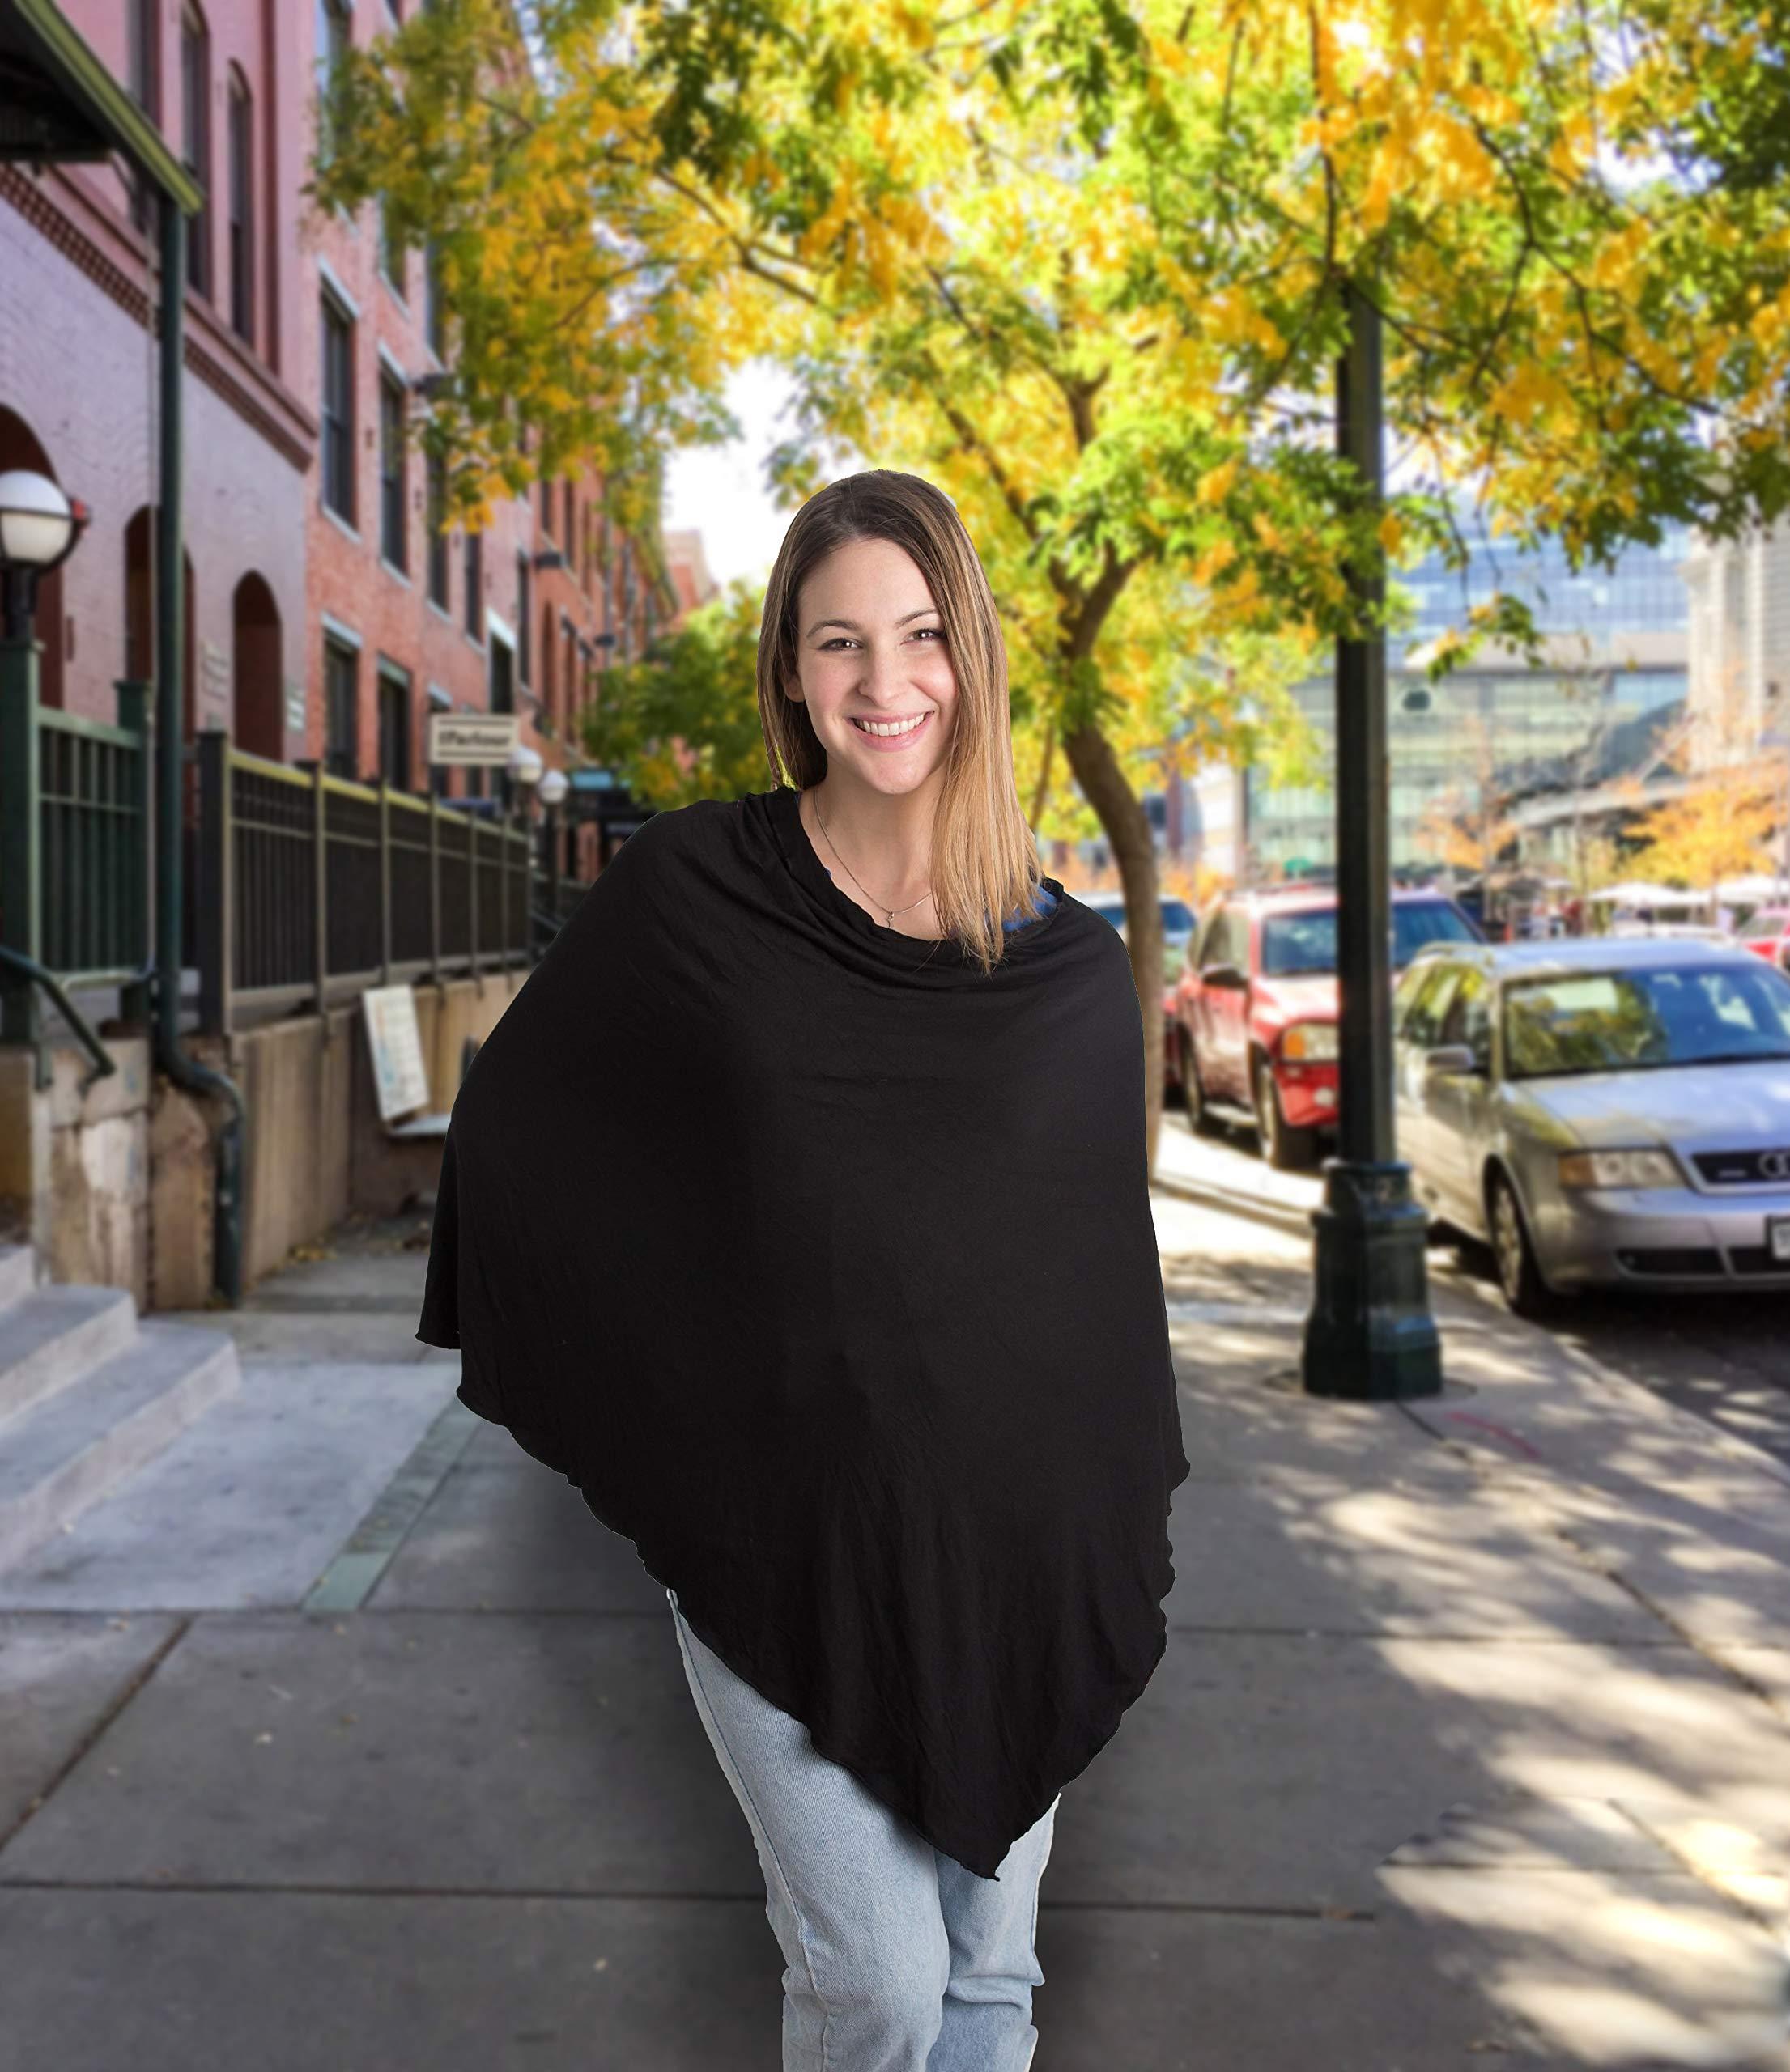 Little Me Nursing Shawl, Black, Nursing Covers Breastfeeding Cover by Little Me